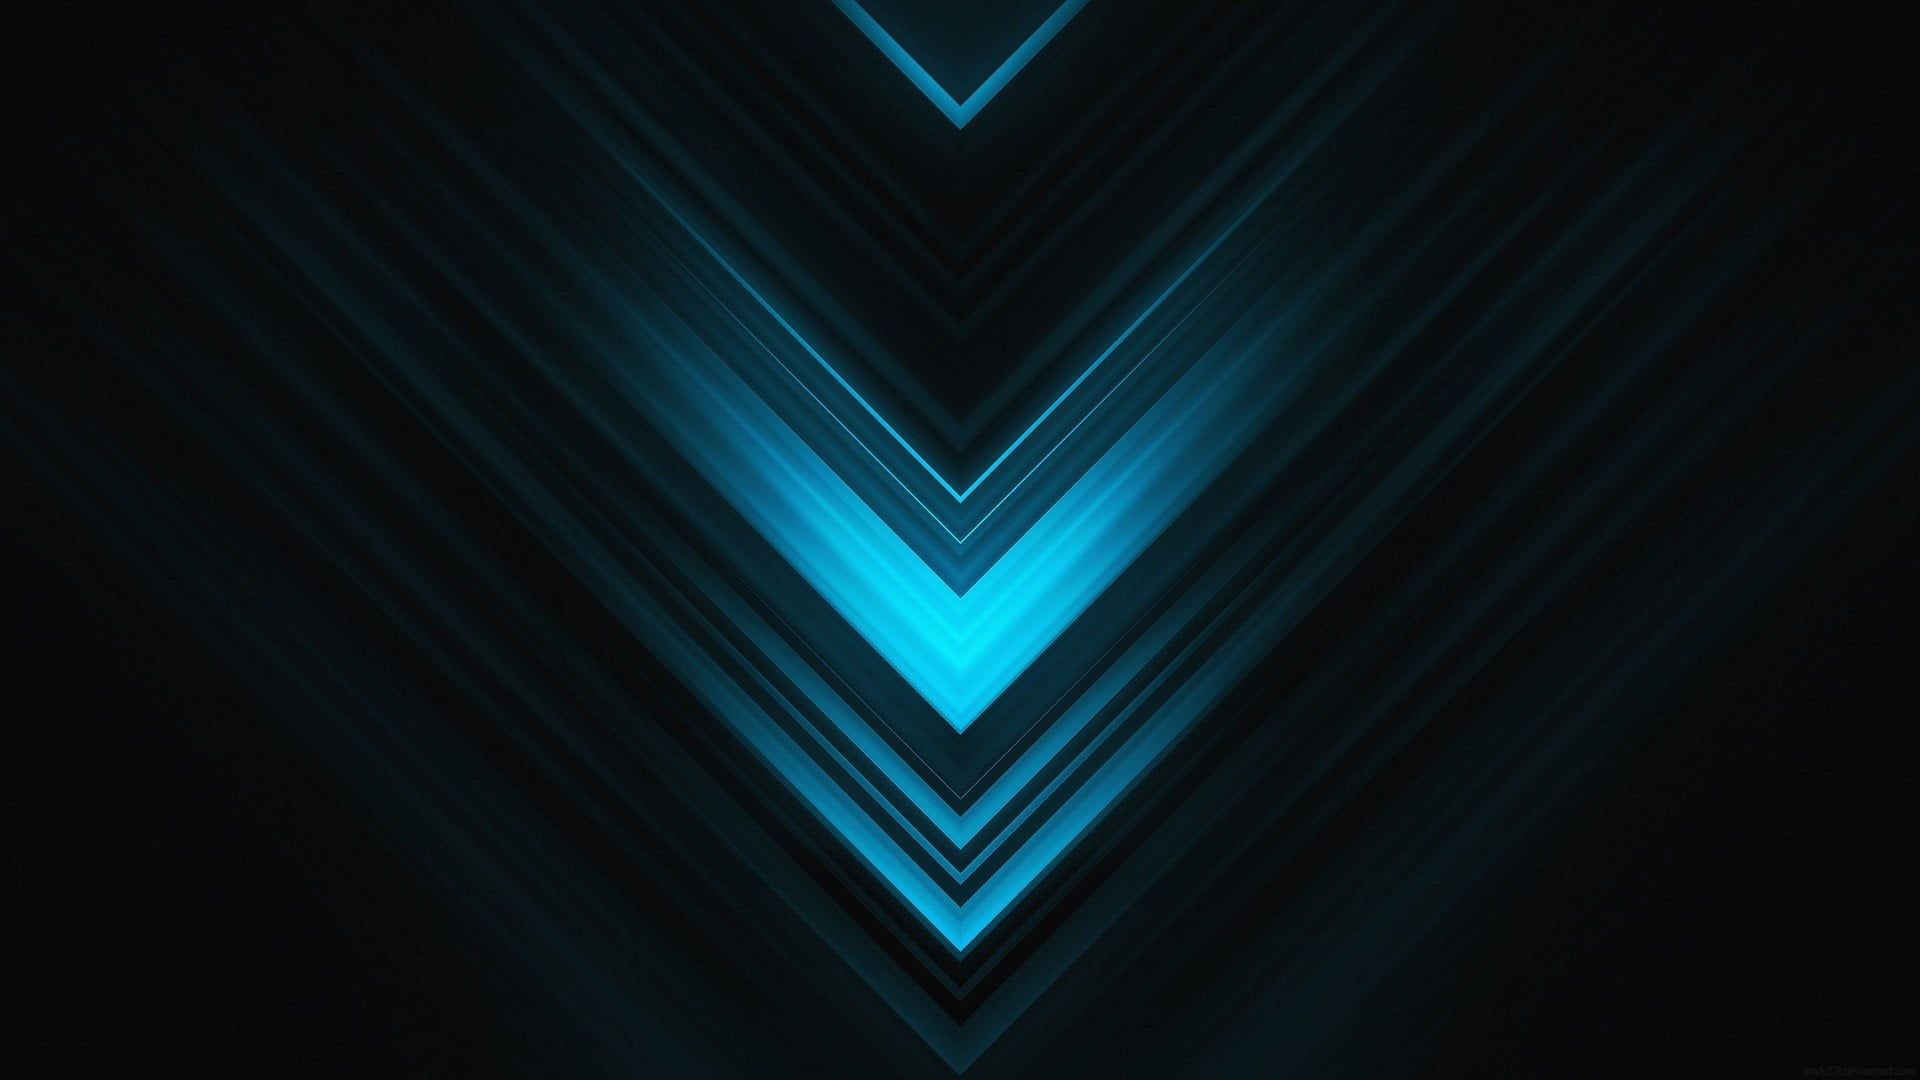 Black And Blue Wallpaper Digital Art Lines 1080p Wallpaper Hdwallpaper Desktop Black And Blue Wallpaper Red And Black Wallpaper Blue Wallpapers